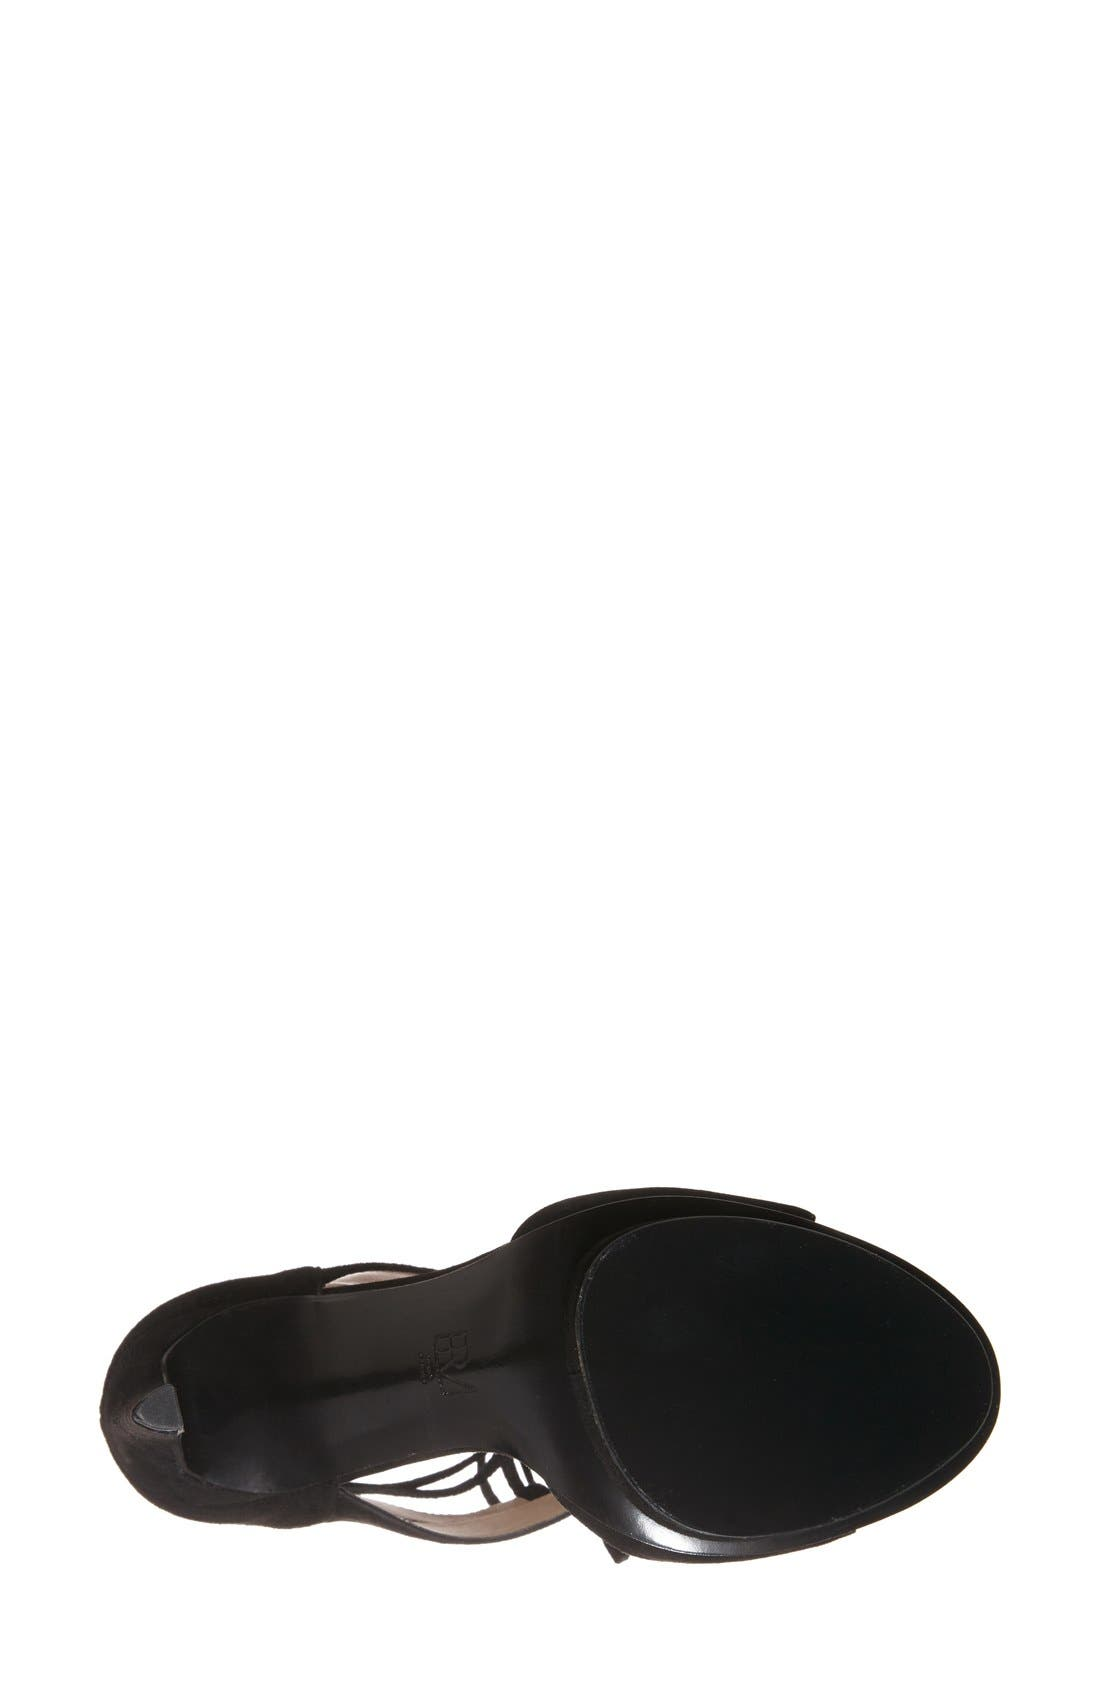 'Talbot' Lace-Up Sandal,                             Alternate thumbnail 2, color,                             001